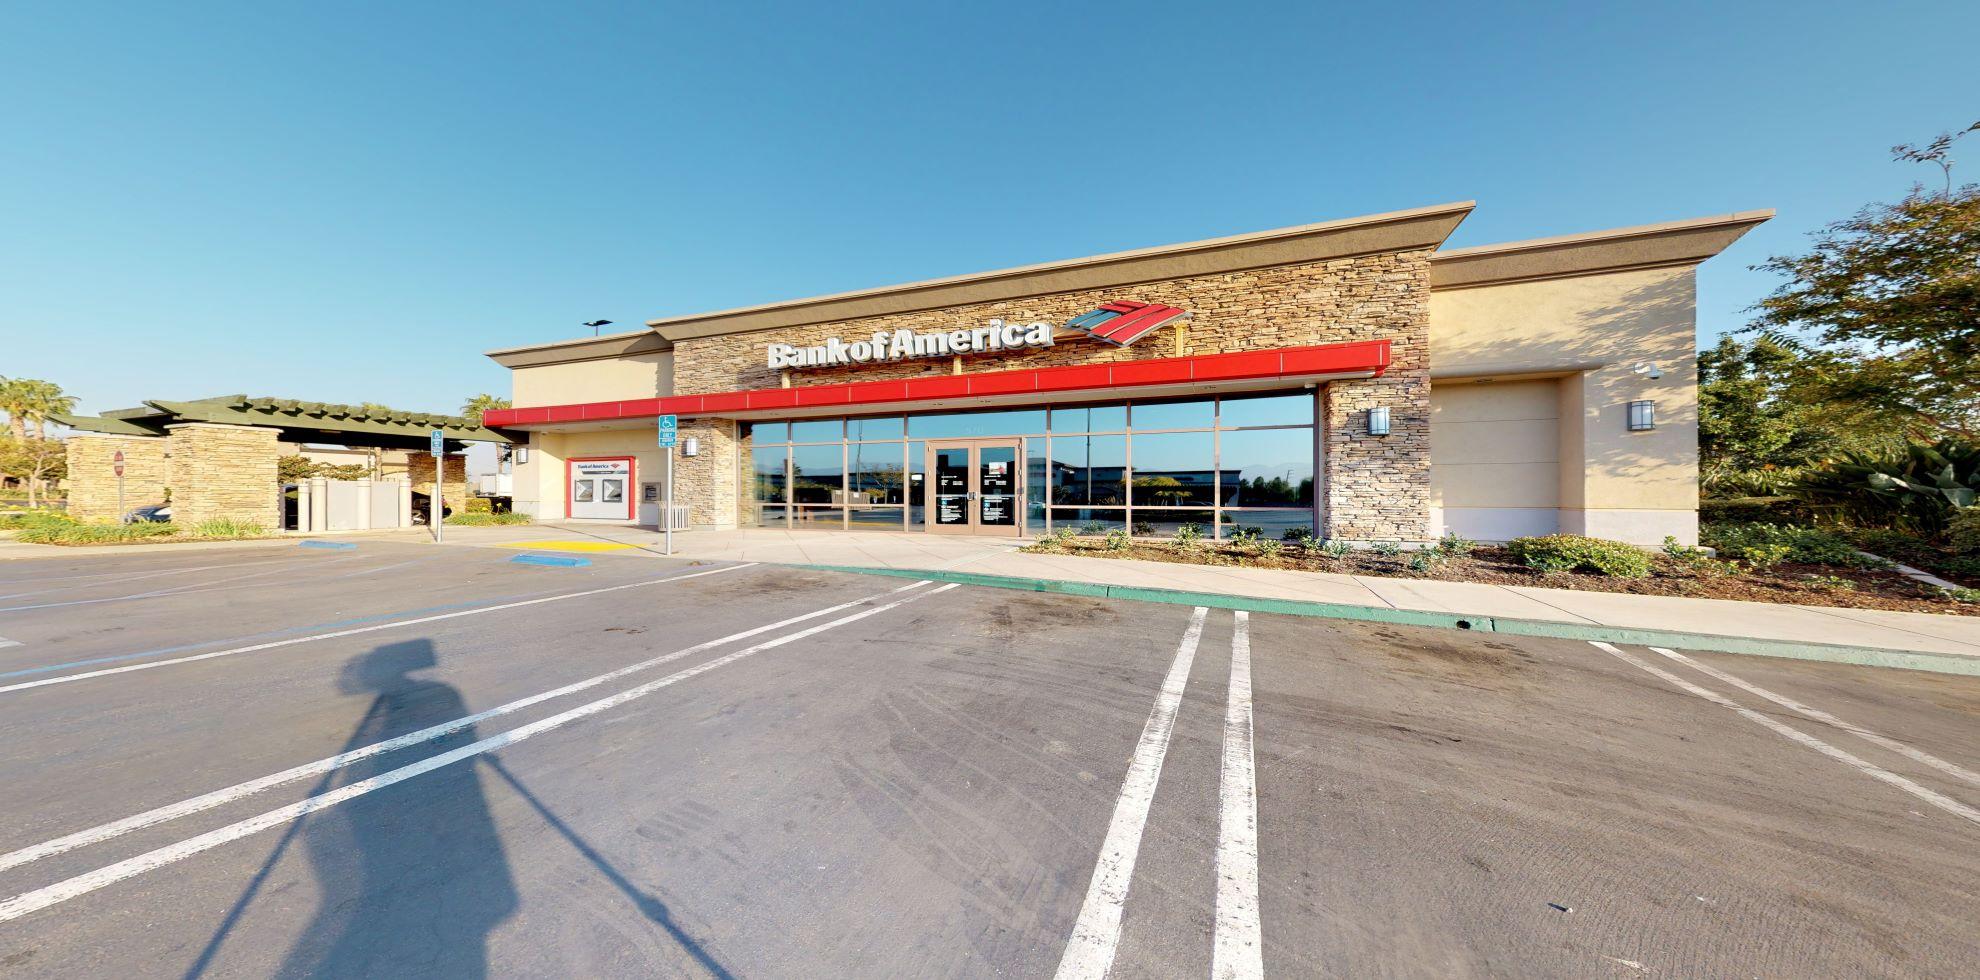 Bank of America financial center with drive-thru ATM | 570 Hidden Valley Pkwy, Corona, CA 92879